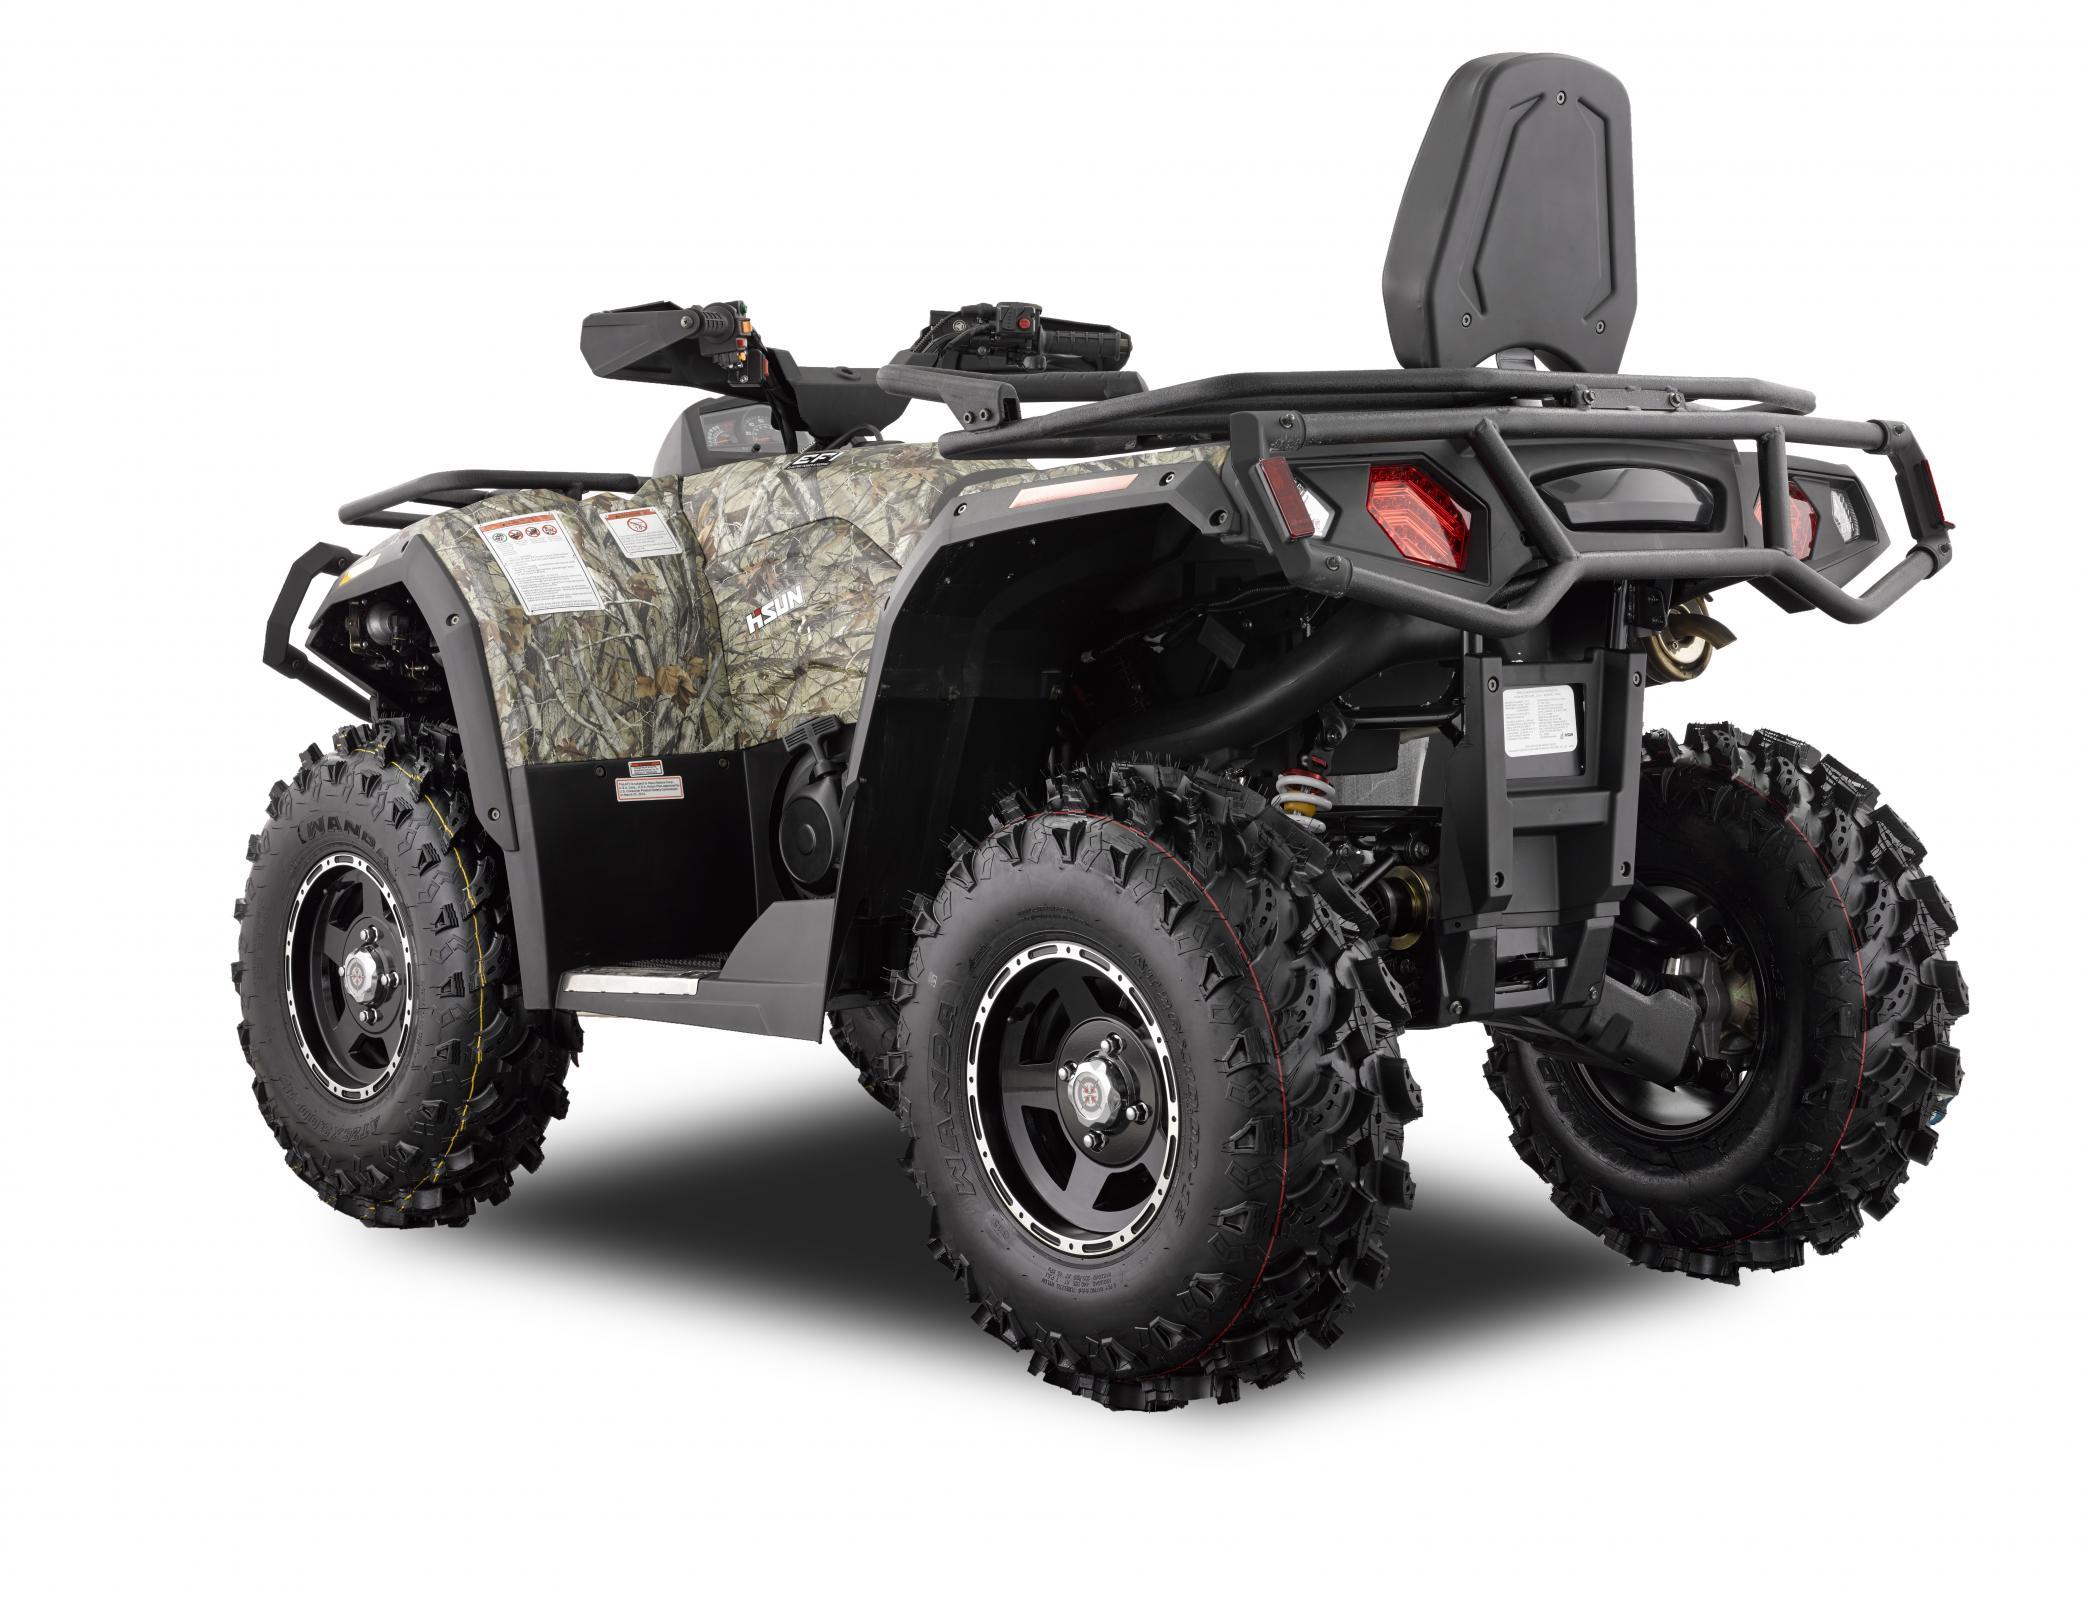 HISUN Motors Introduces New 2-UP ATVs | ATV Illustrated